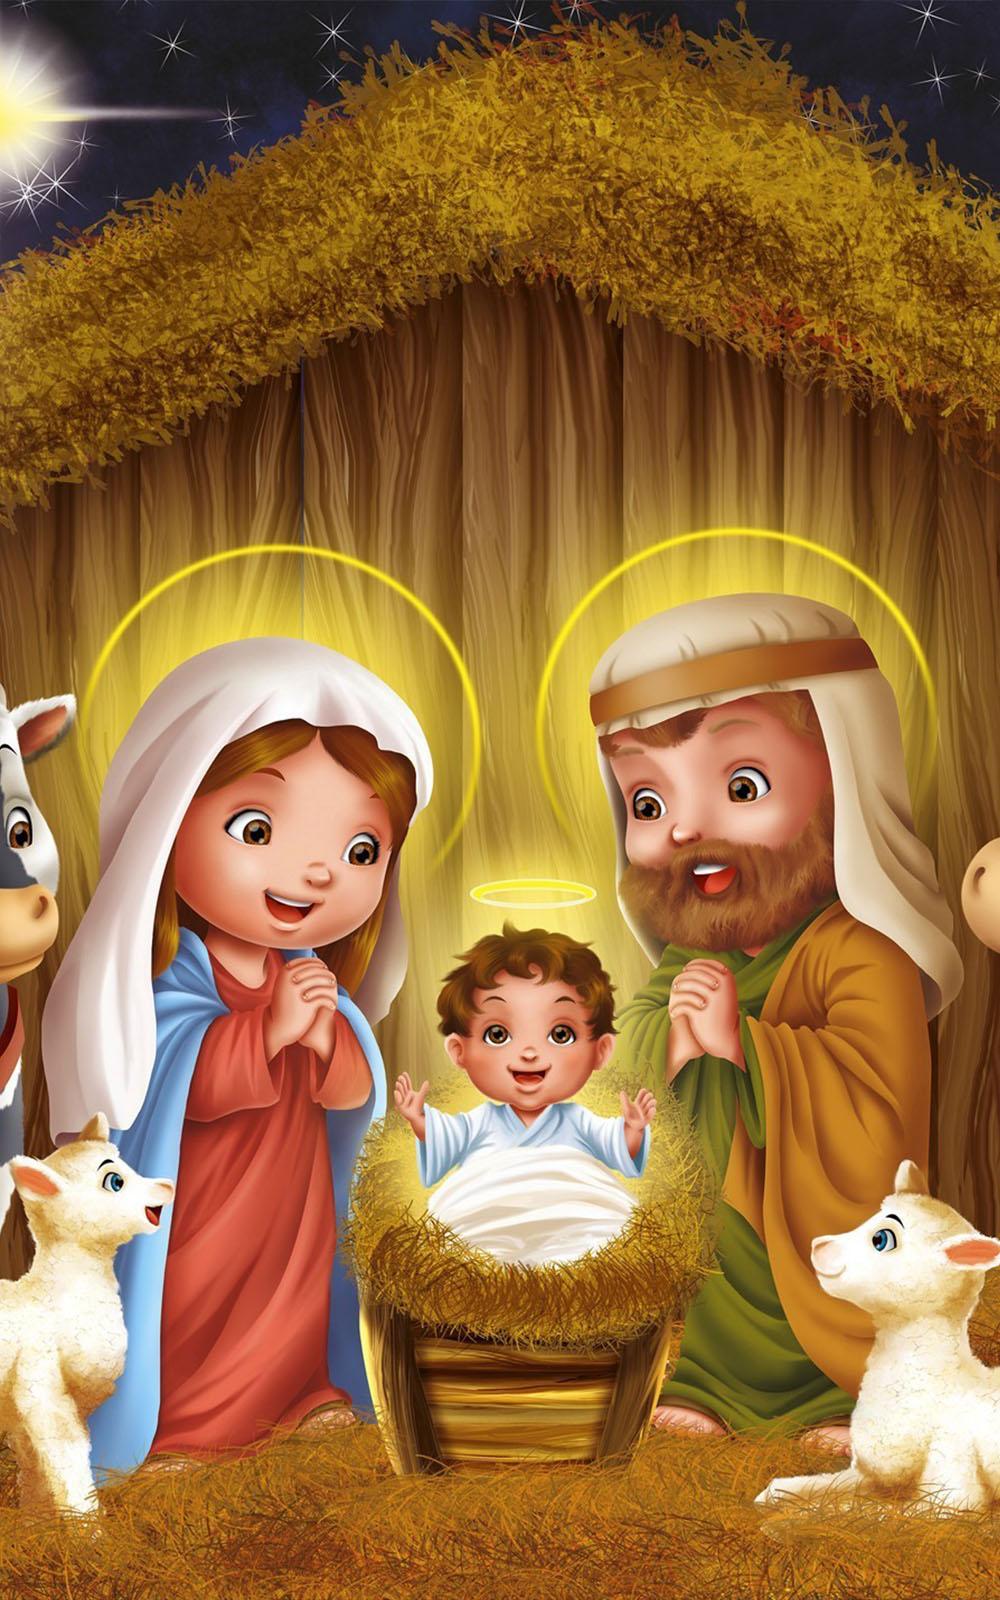 Cute Cartoon Hd Wallpapers For Mobile Download Christmas Jesus Born Artwork Free Pure 4k Ultra